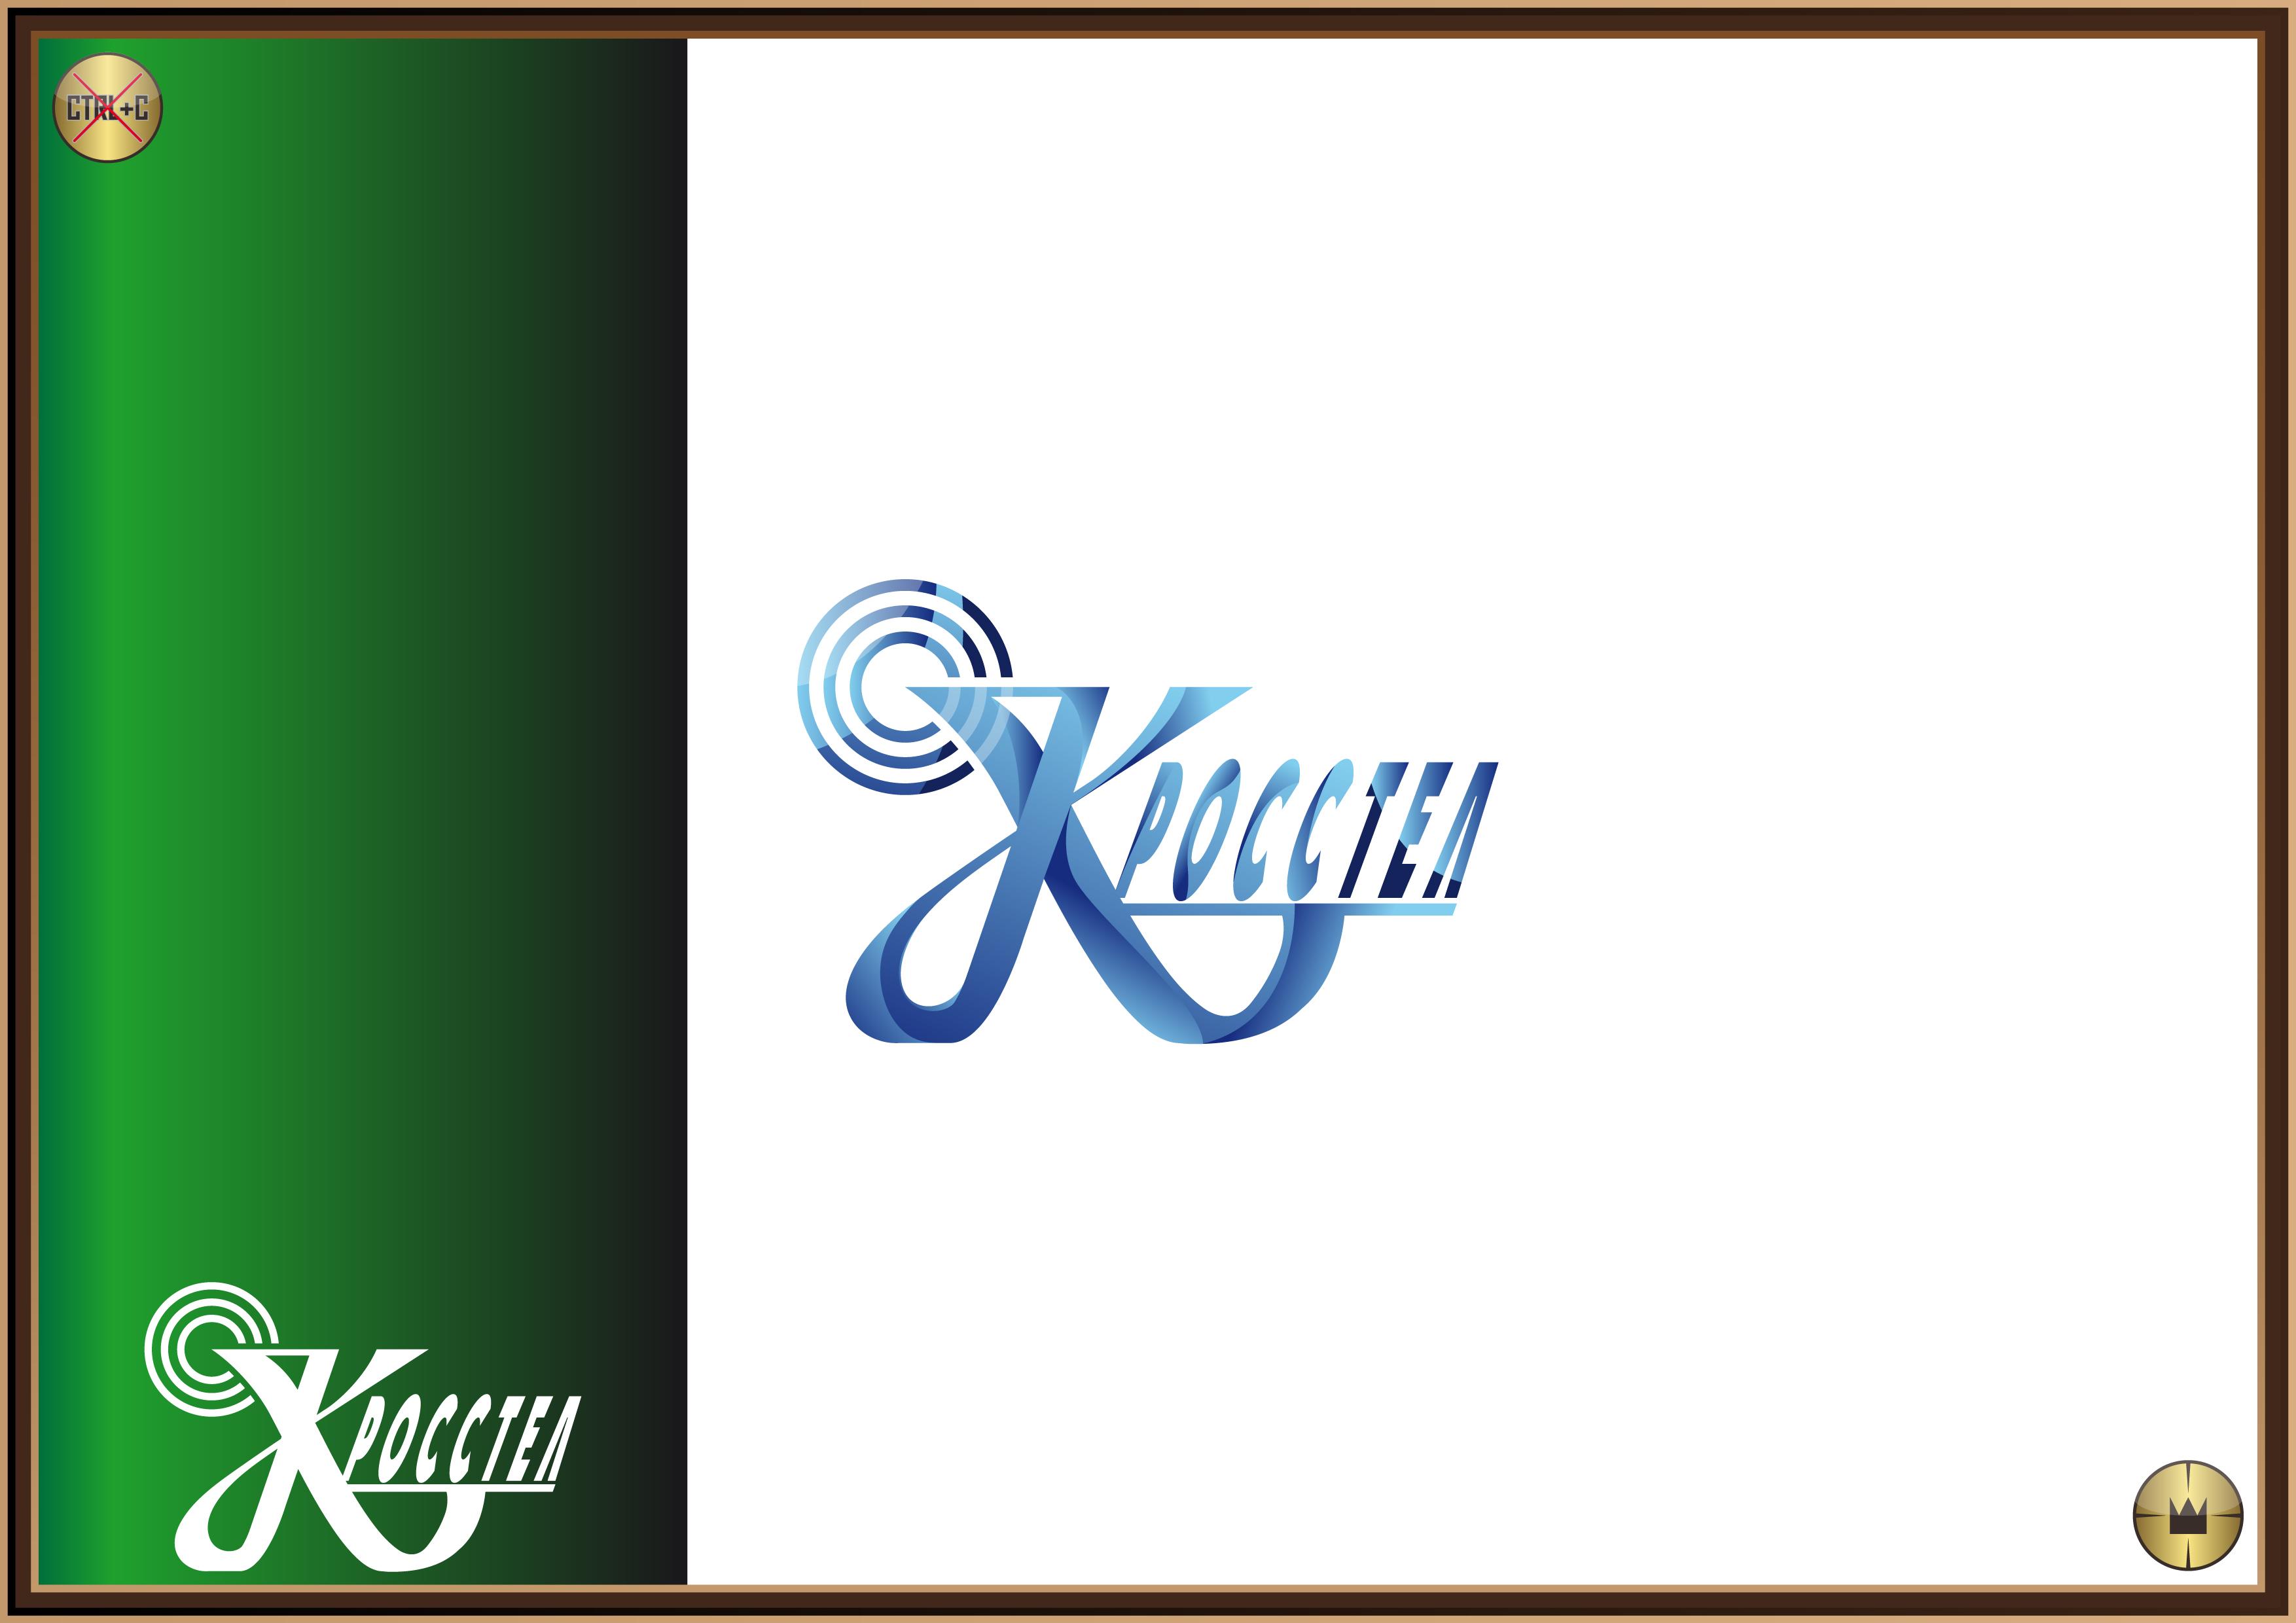 Логотип для компании оператора связи фото f_4ee7088ca60ea.jpg